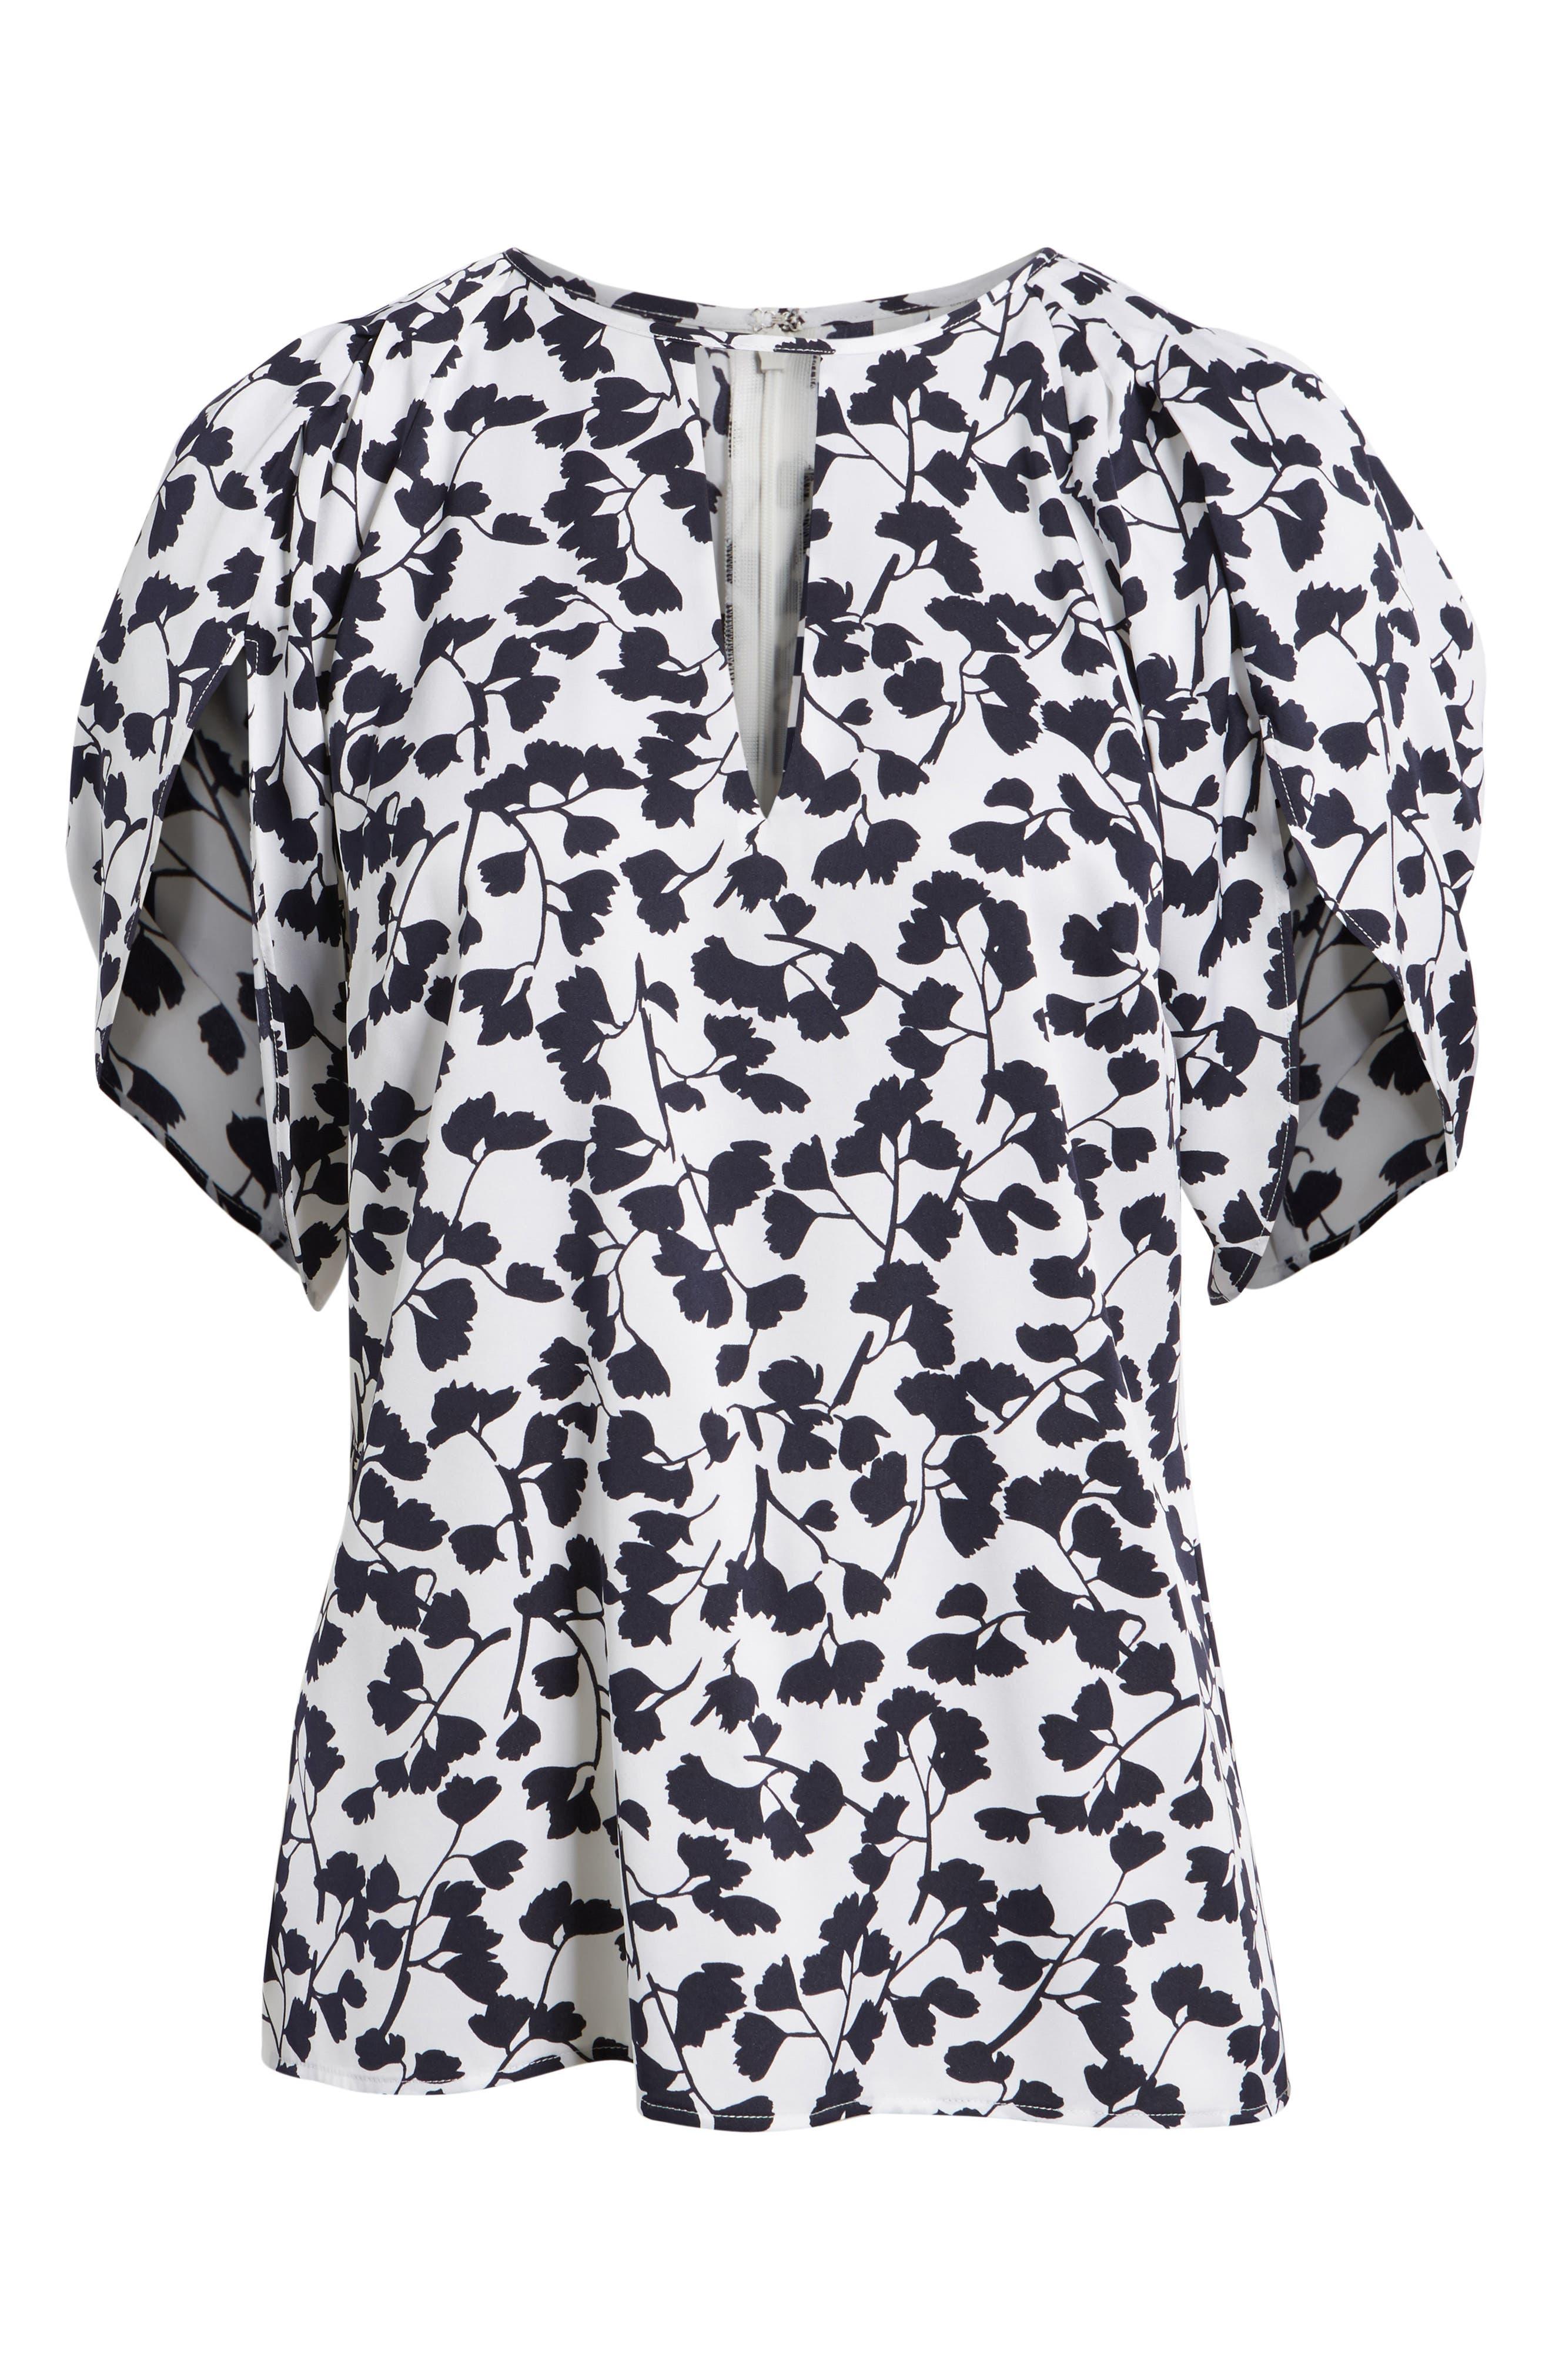 Draped Sleeve Stretch Silk Top,                             Alternate thumbnail 7, color,                             White Gingko Leaf